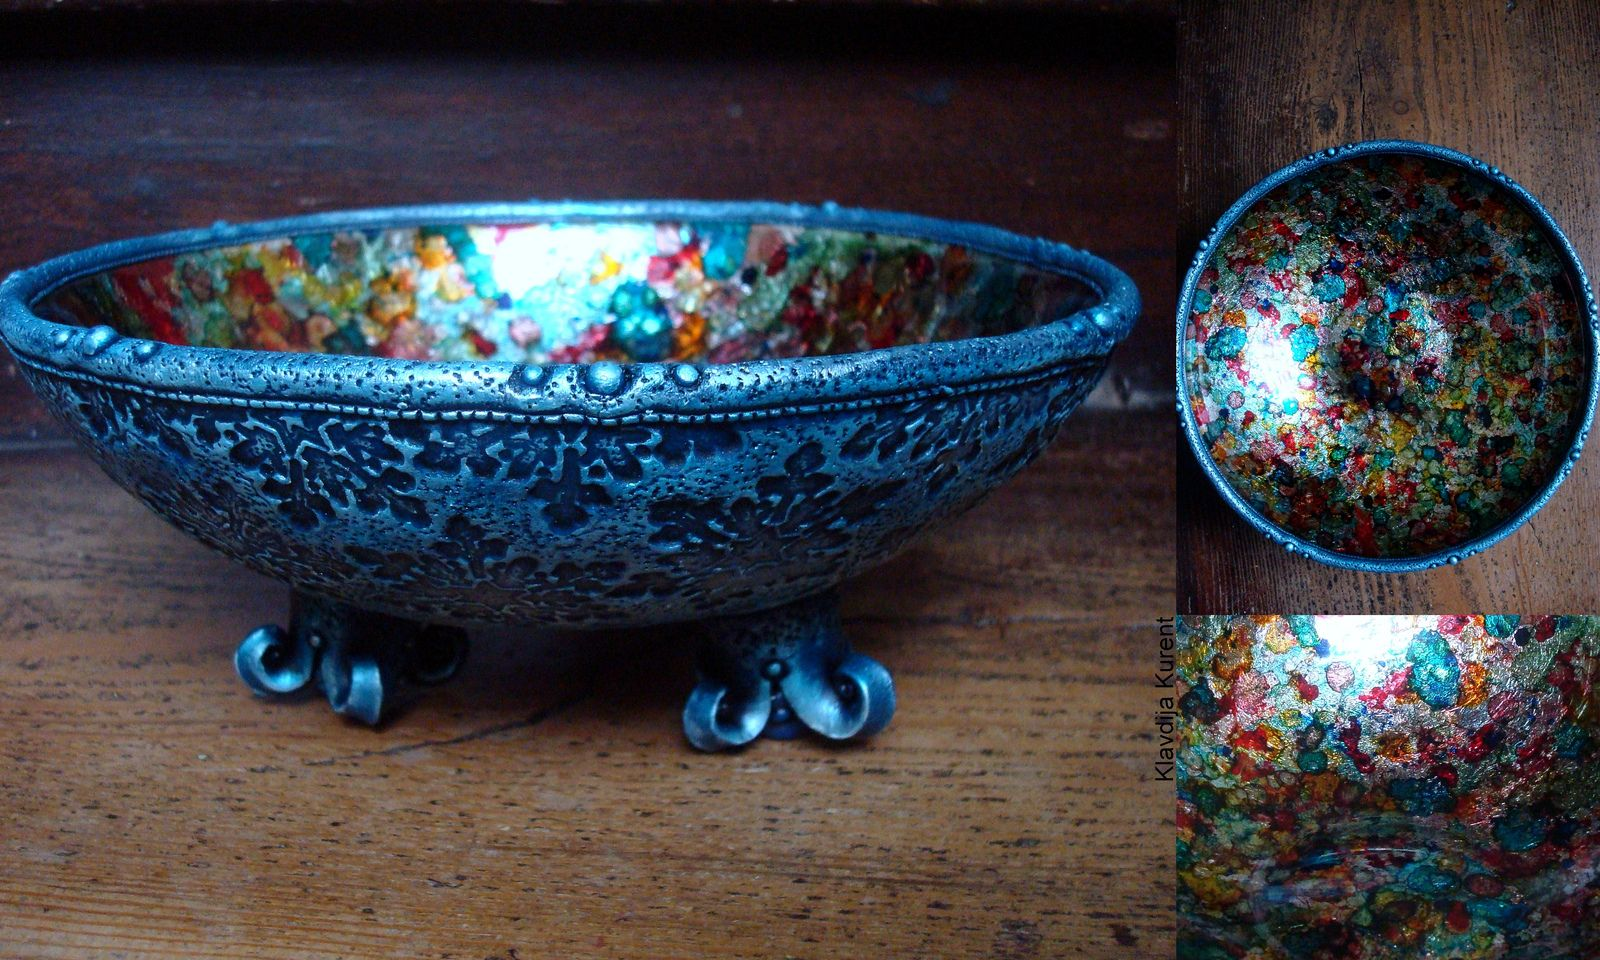 Mixed media- glass bowl(diameter 20cm), inks, Kato Polymer Clay | by Klavdija's corner